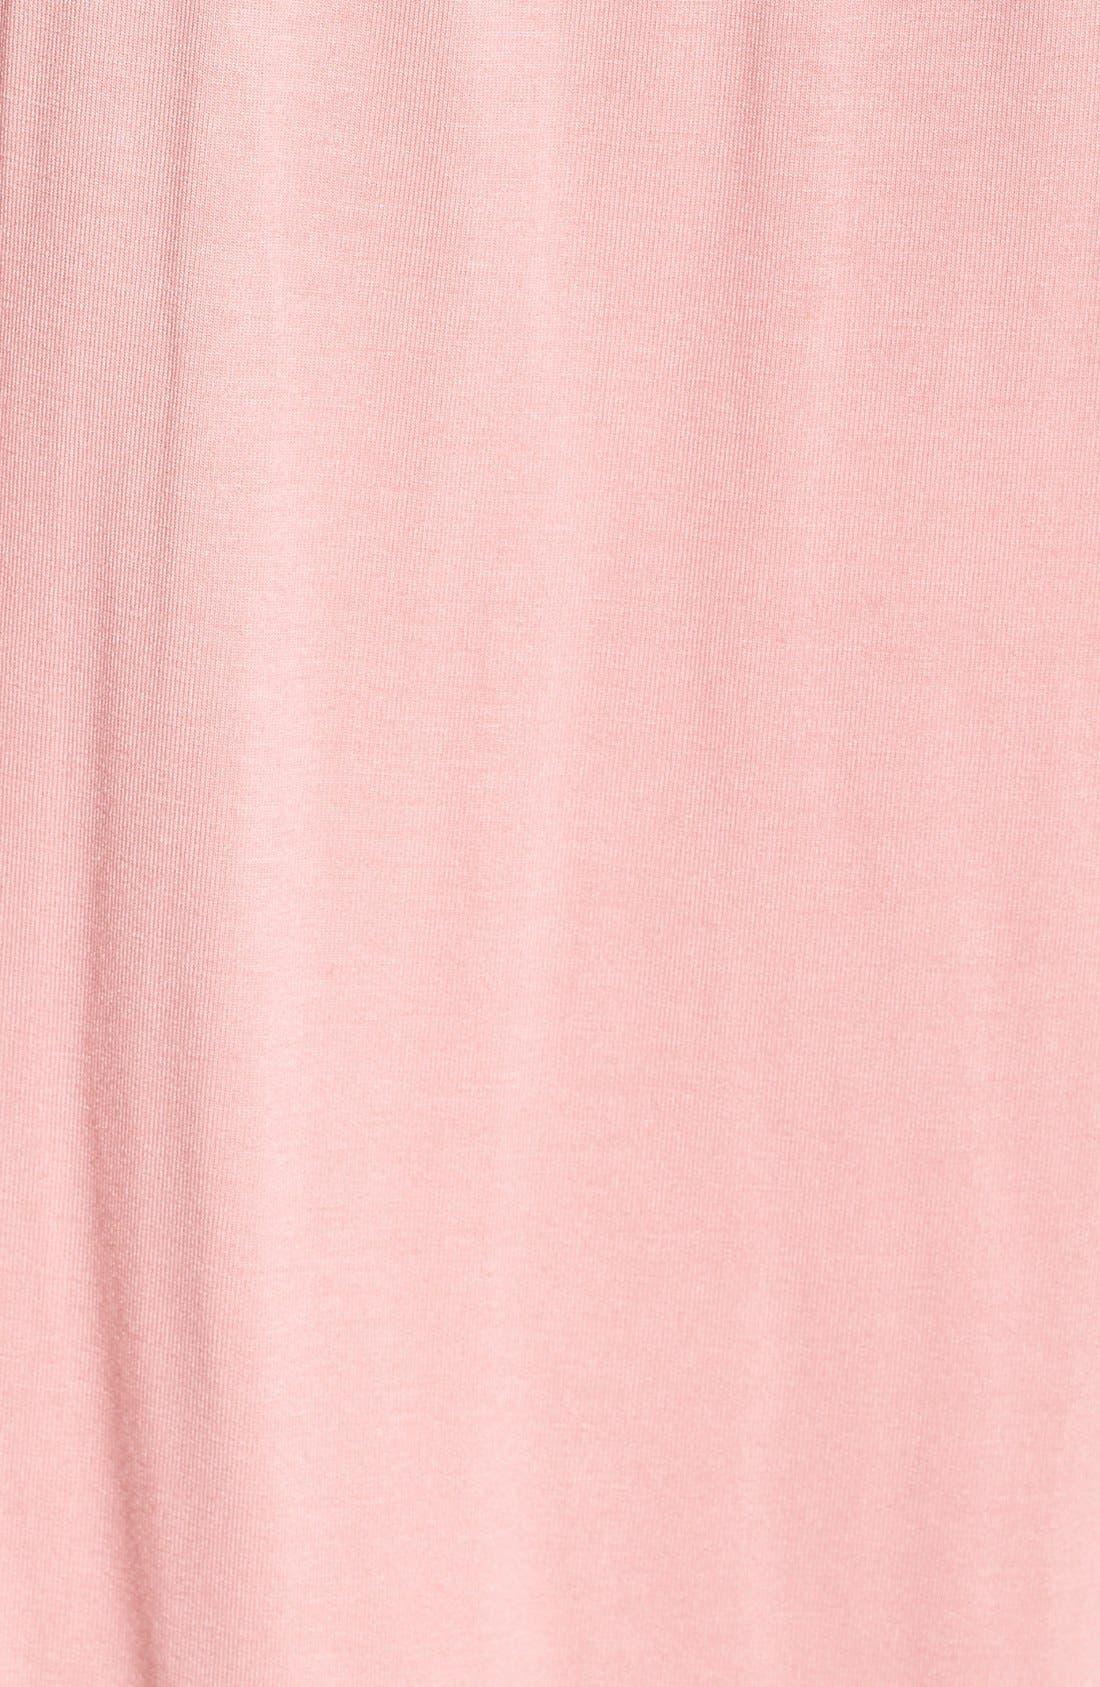 Alternate Image 2  - Belabumbum 'Tallulah' Maternity Tunic & Pants